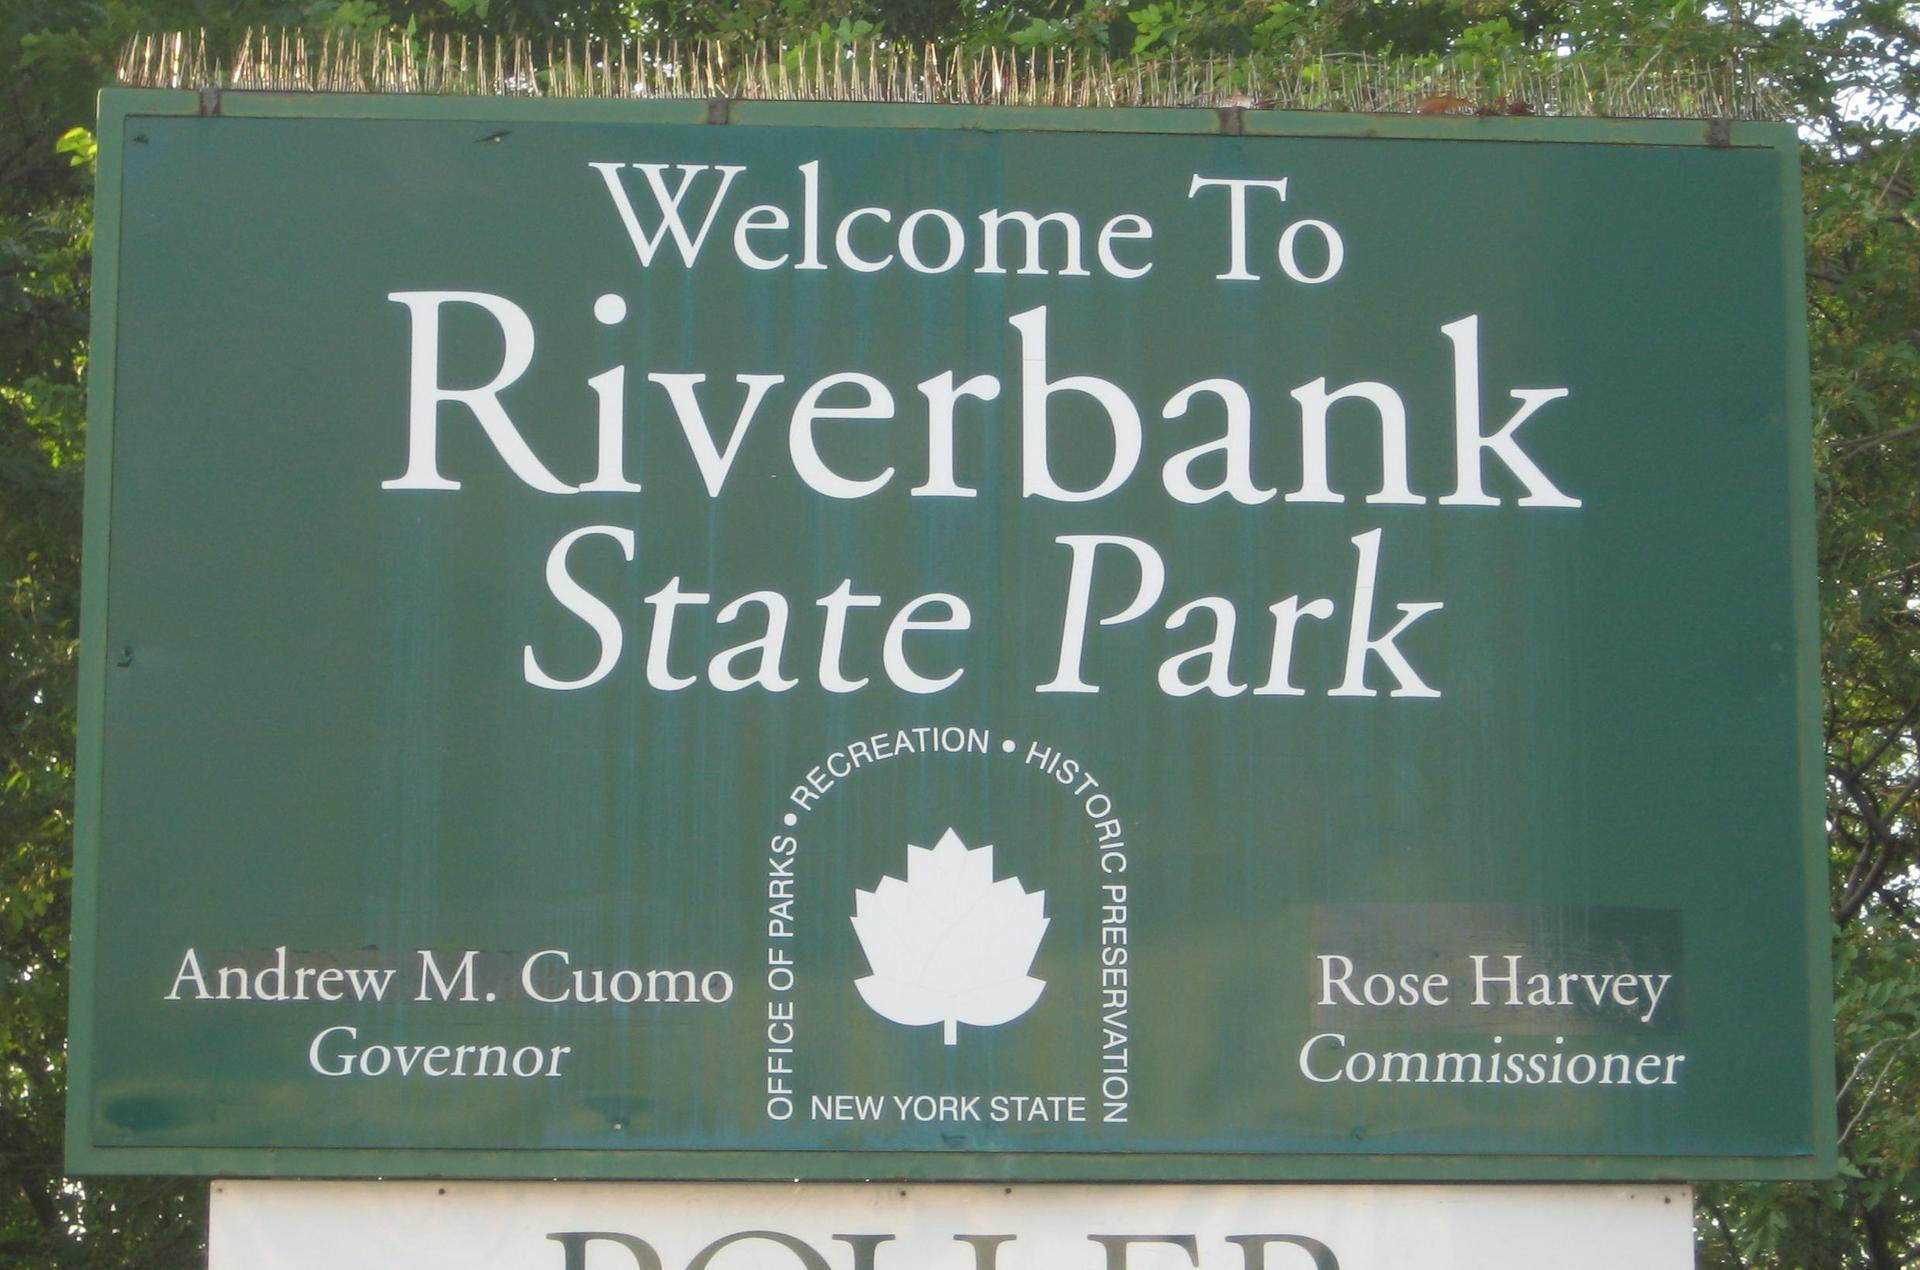 Riverbank State Park Image